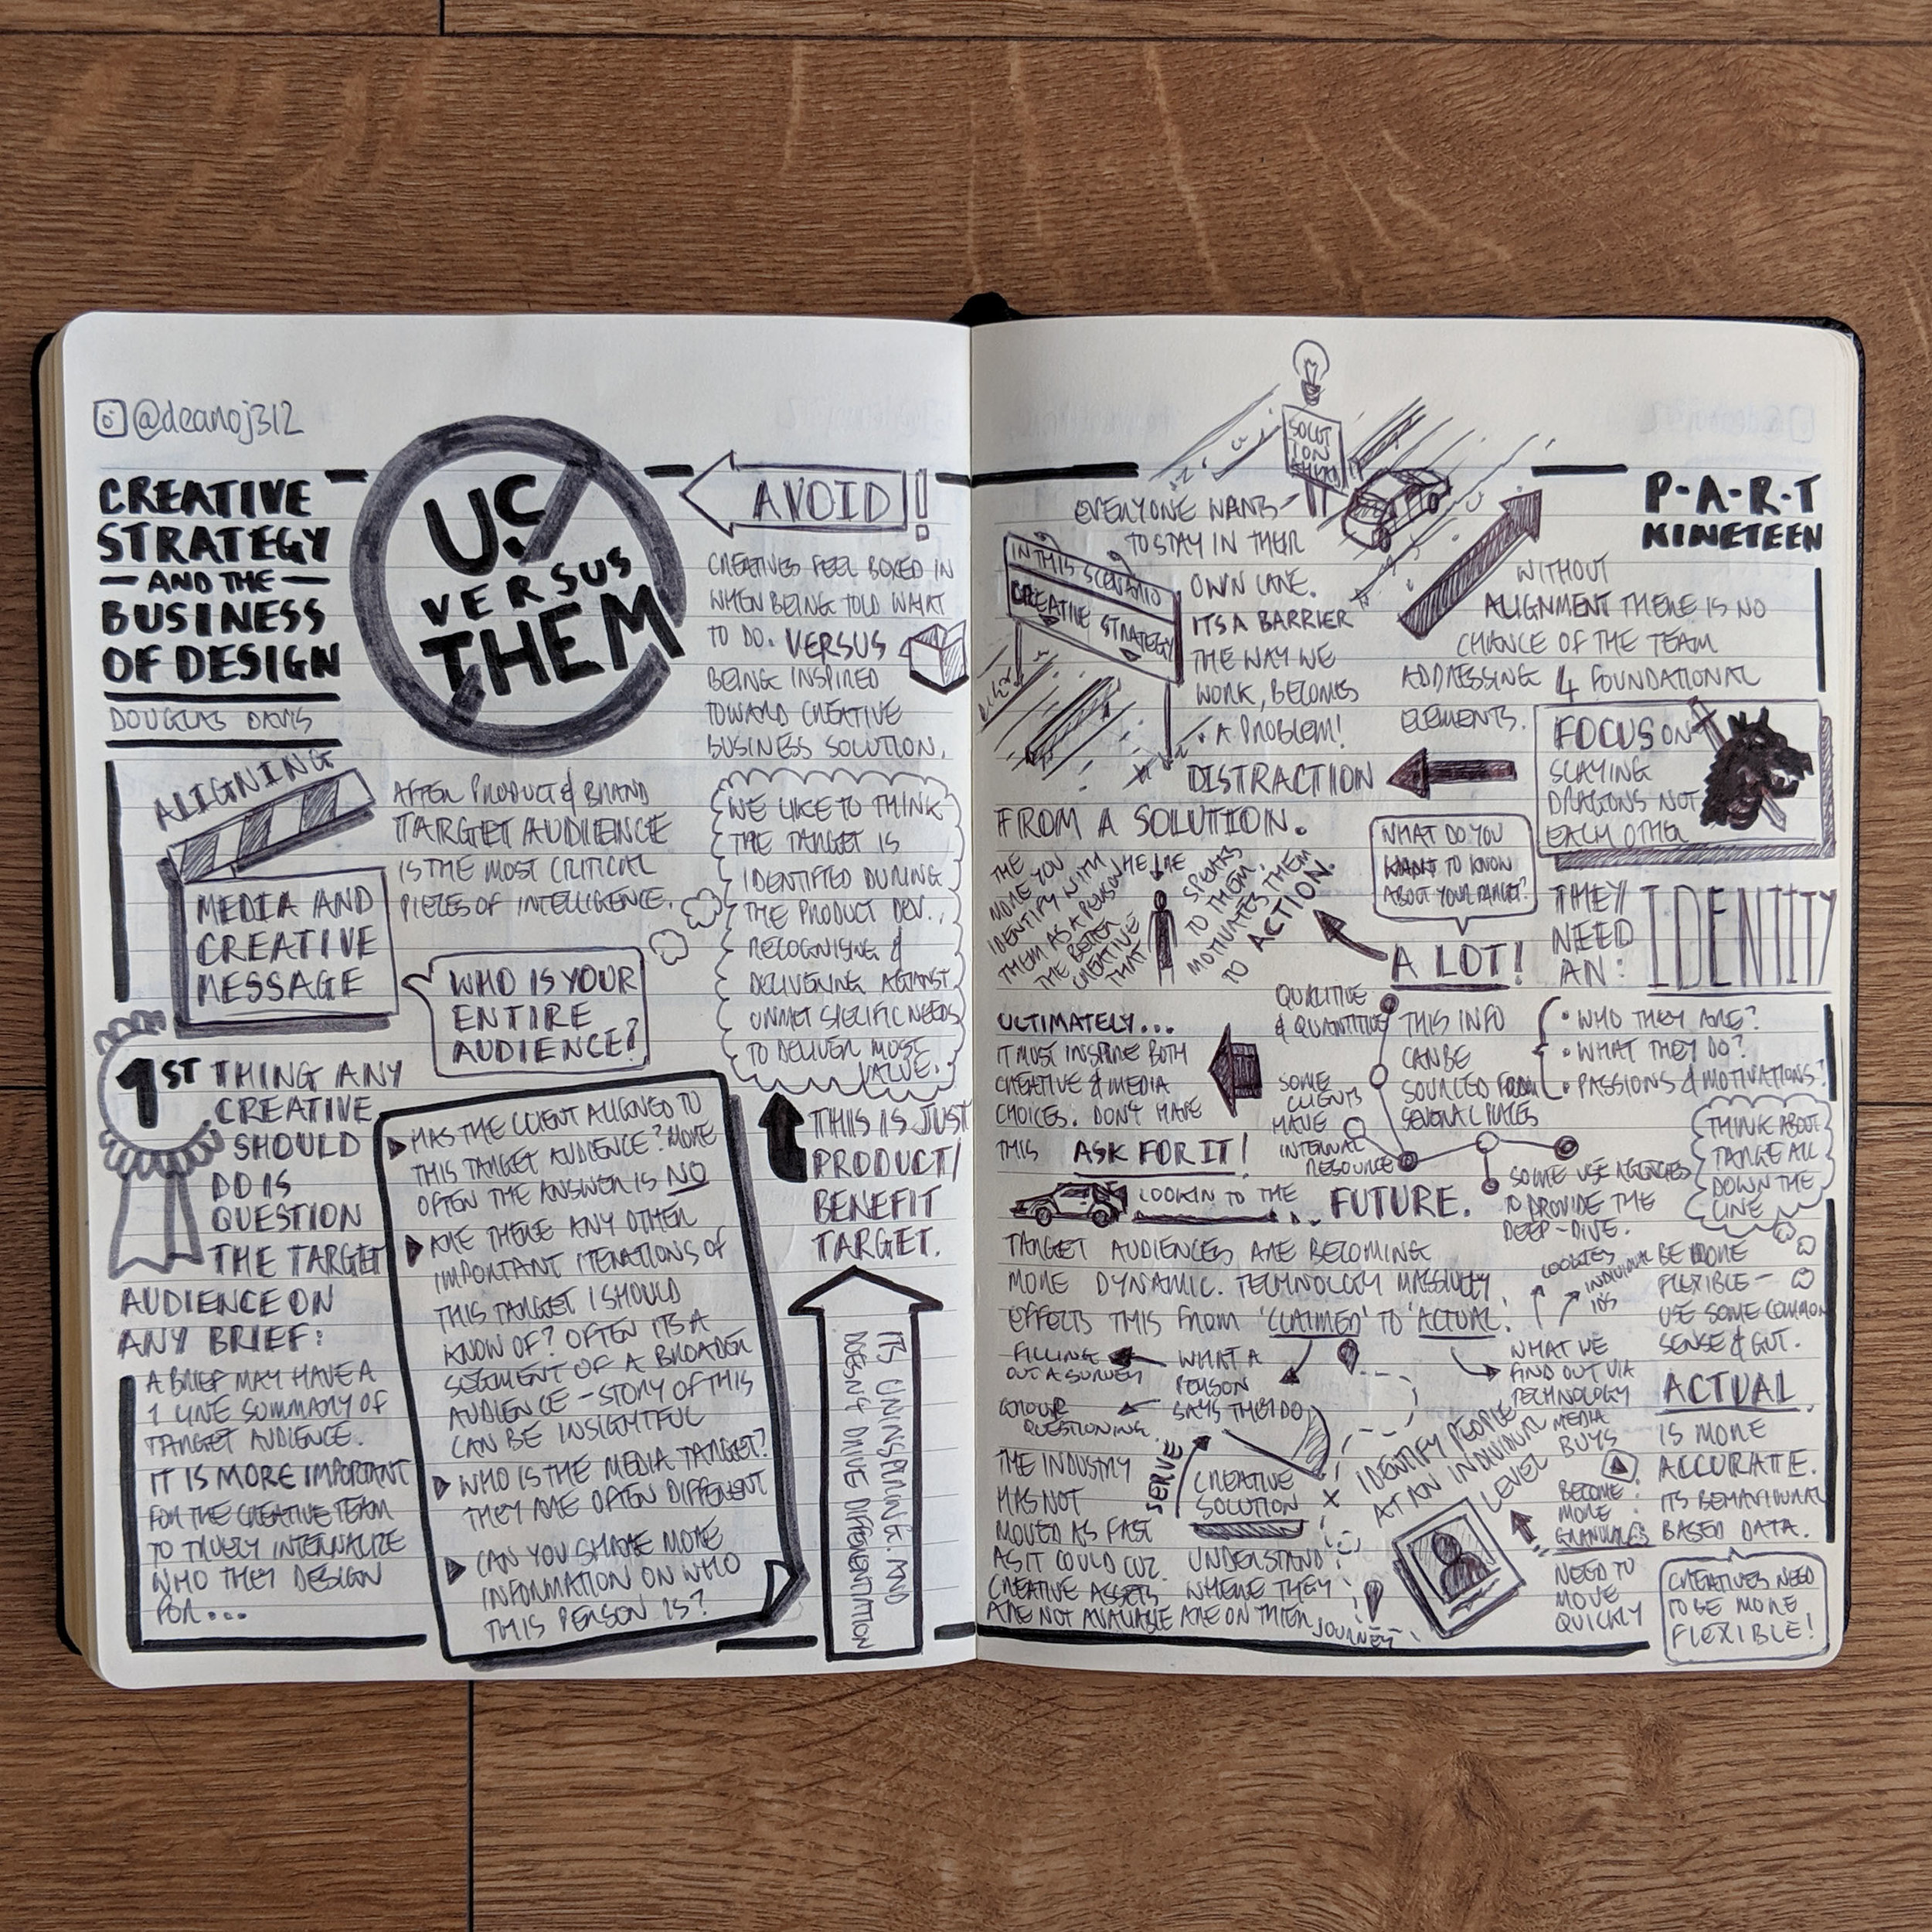 CreativeStrategyAndTheBusinessOfDesign_Part19.1.jpg